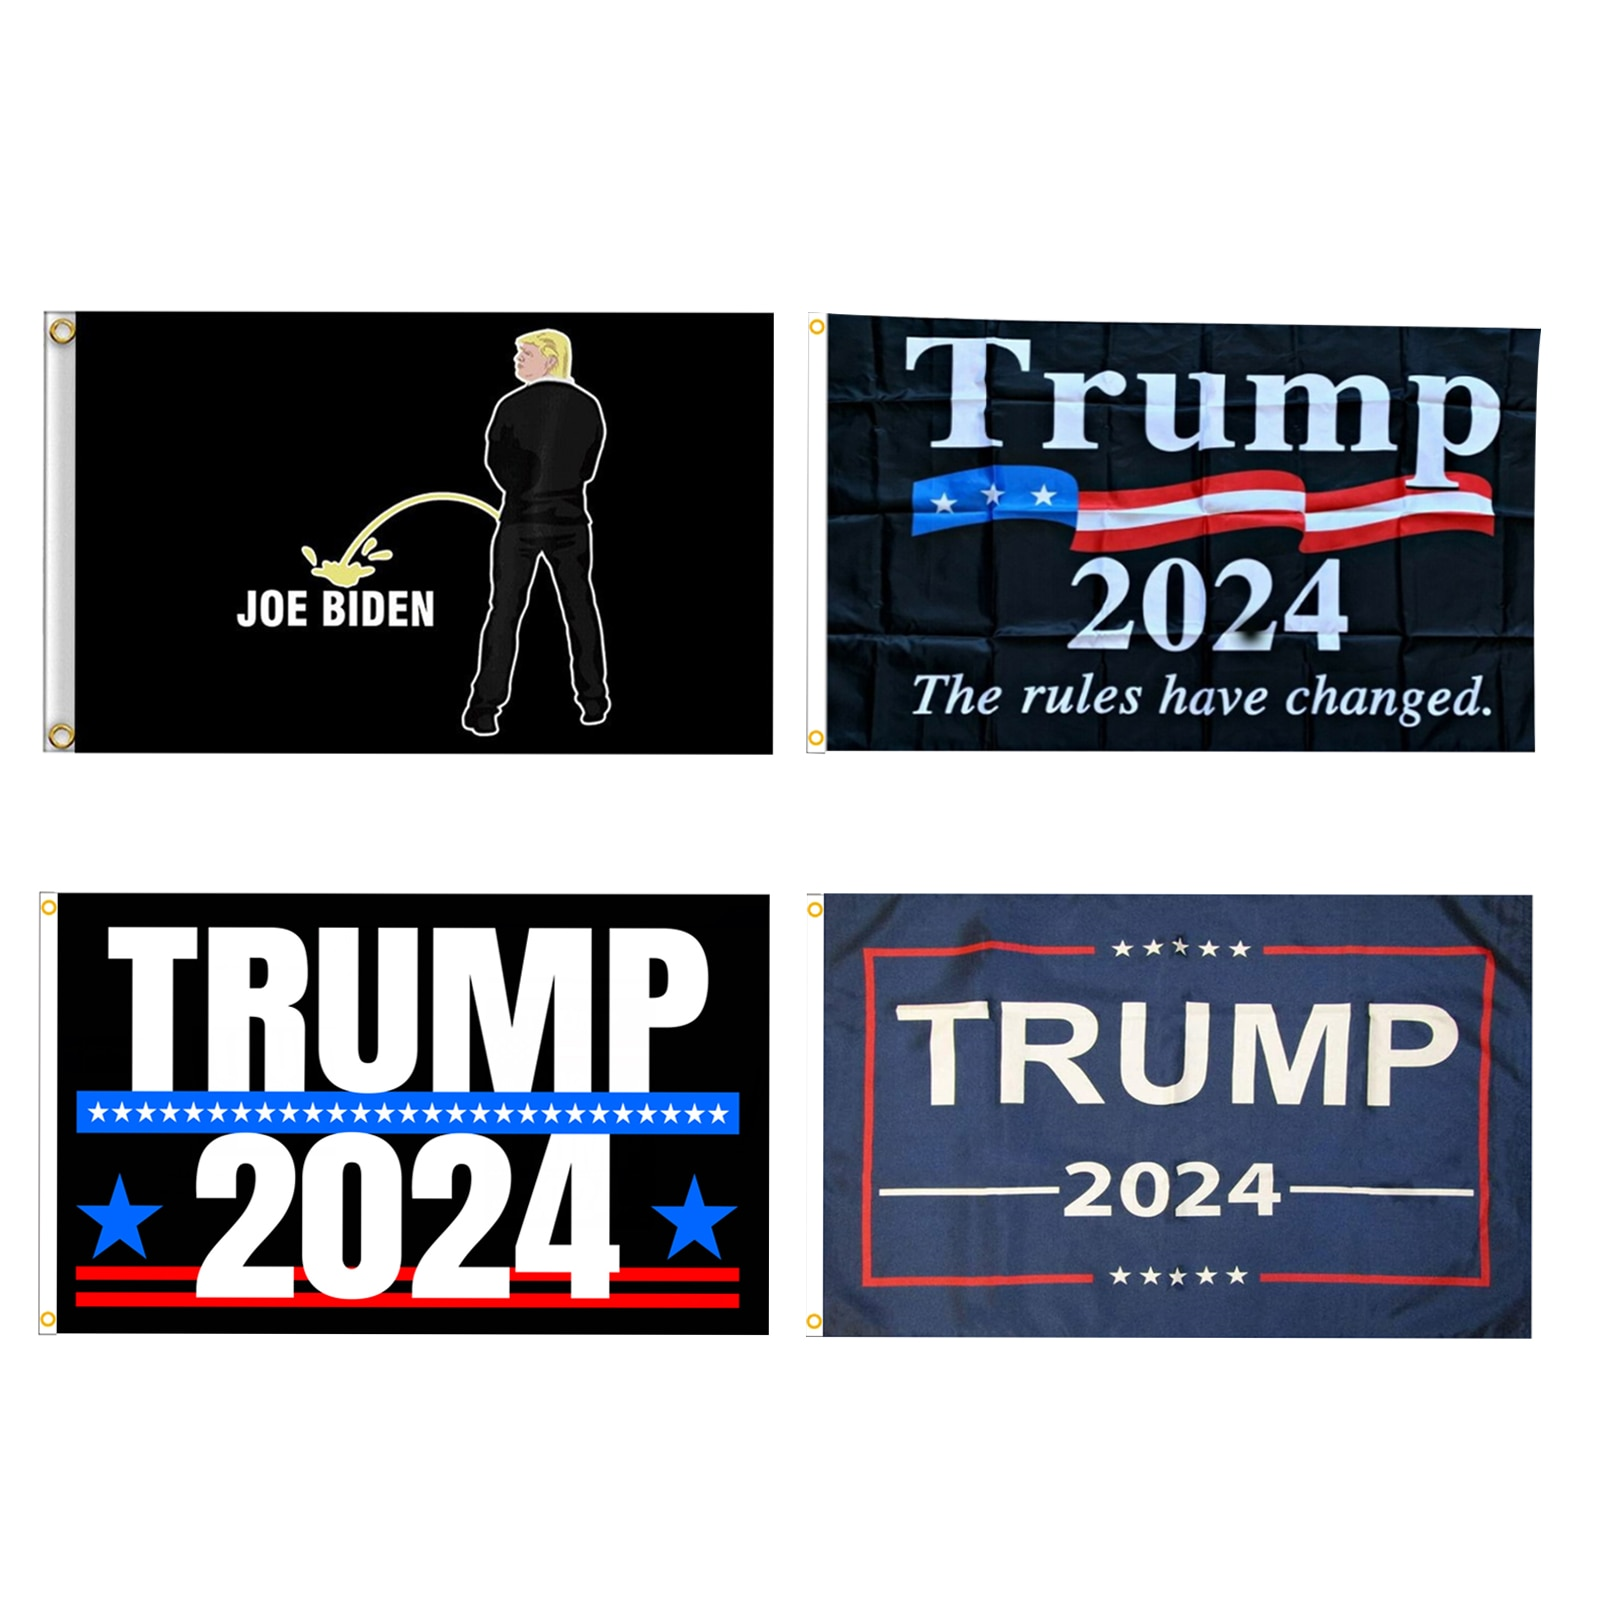 Trump 2024 drapeau avec 2 œillets polyéthylène 100D polyéthylène Nylon bannière drapeau délection 90*150cm